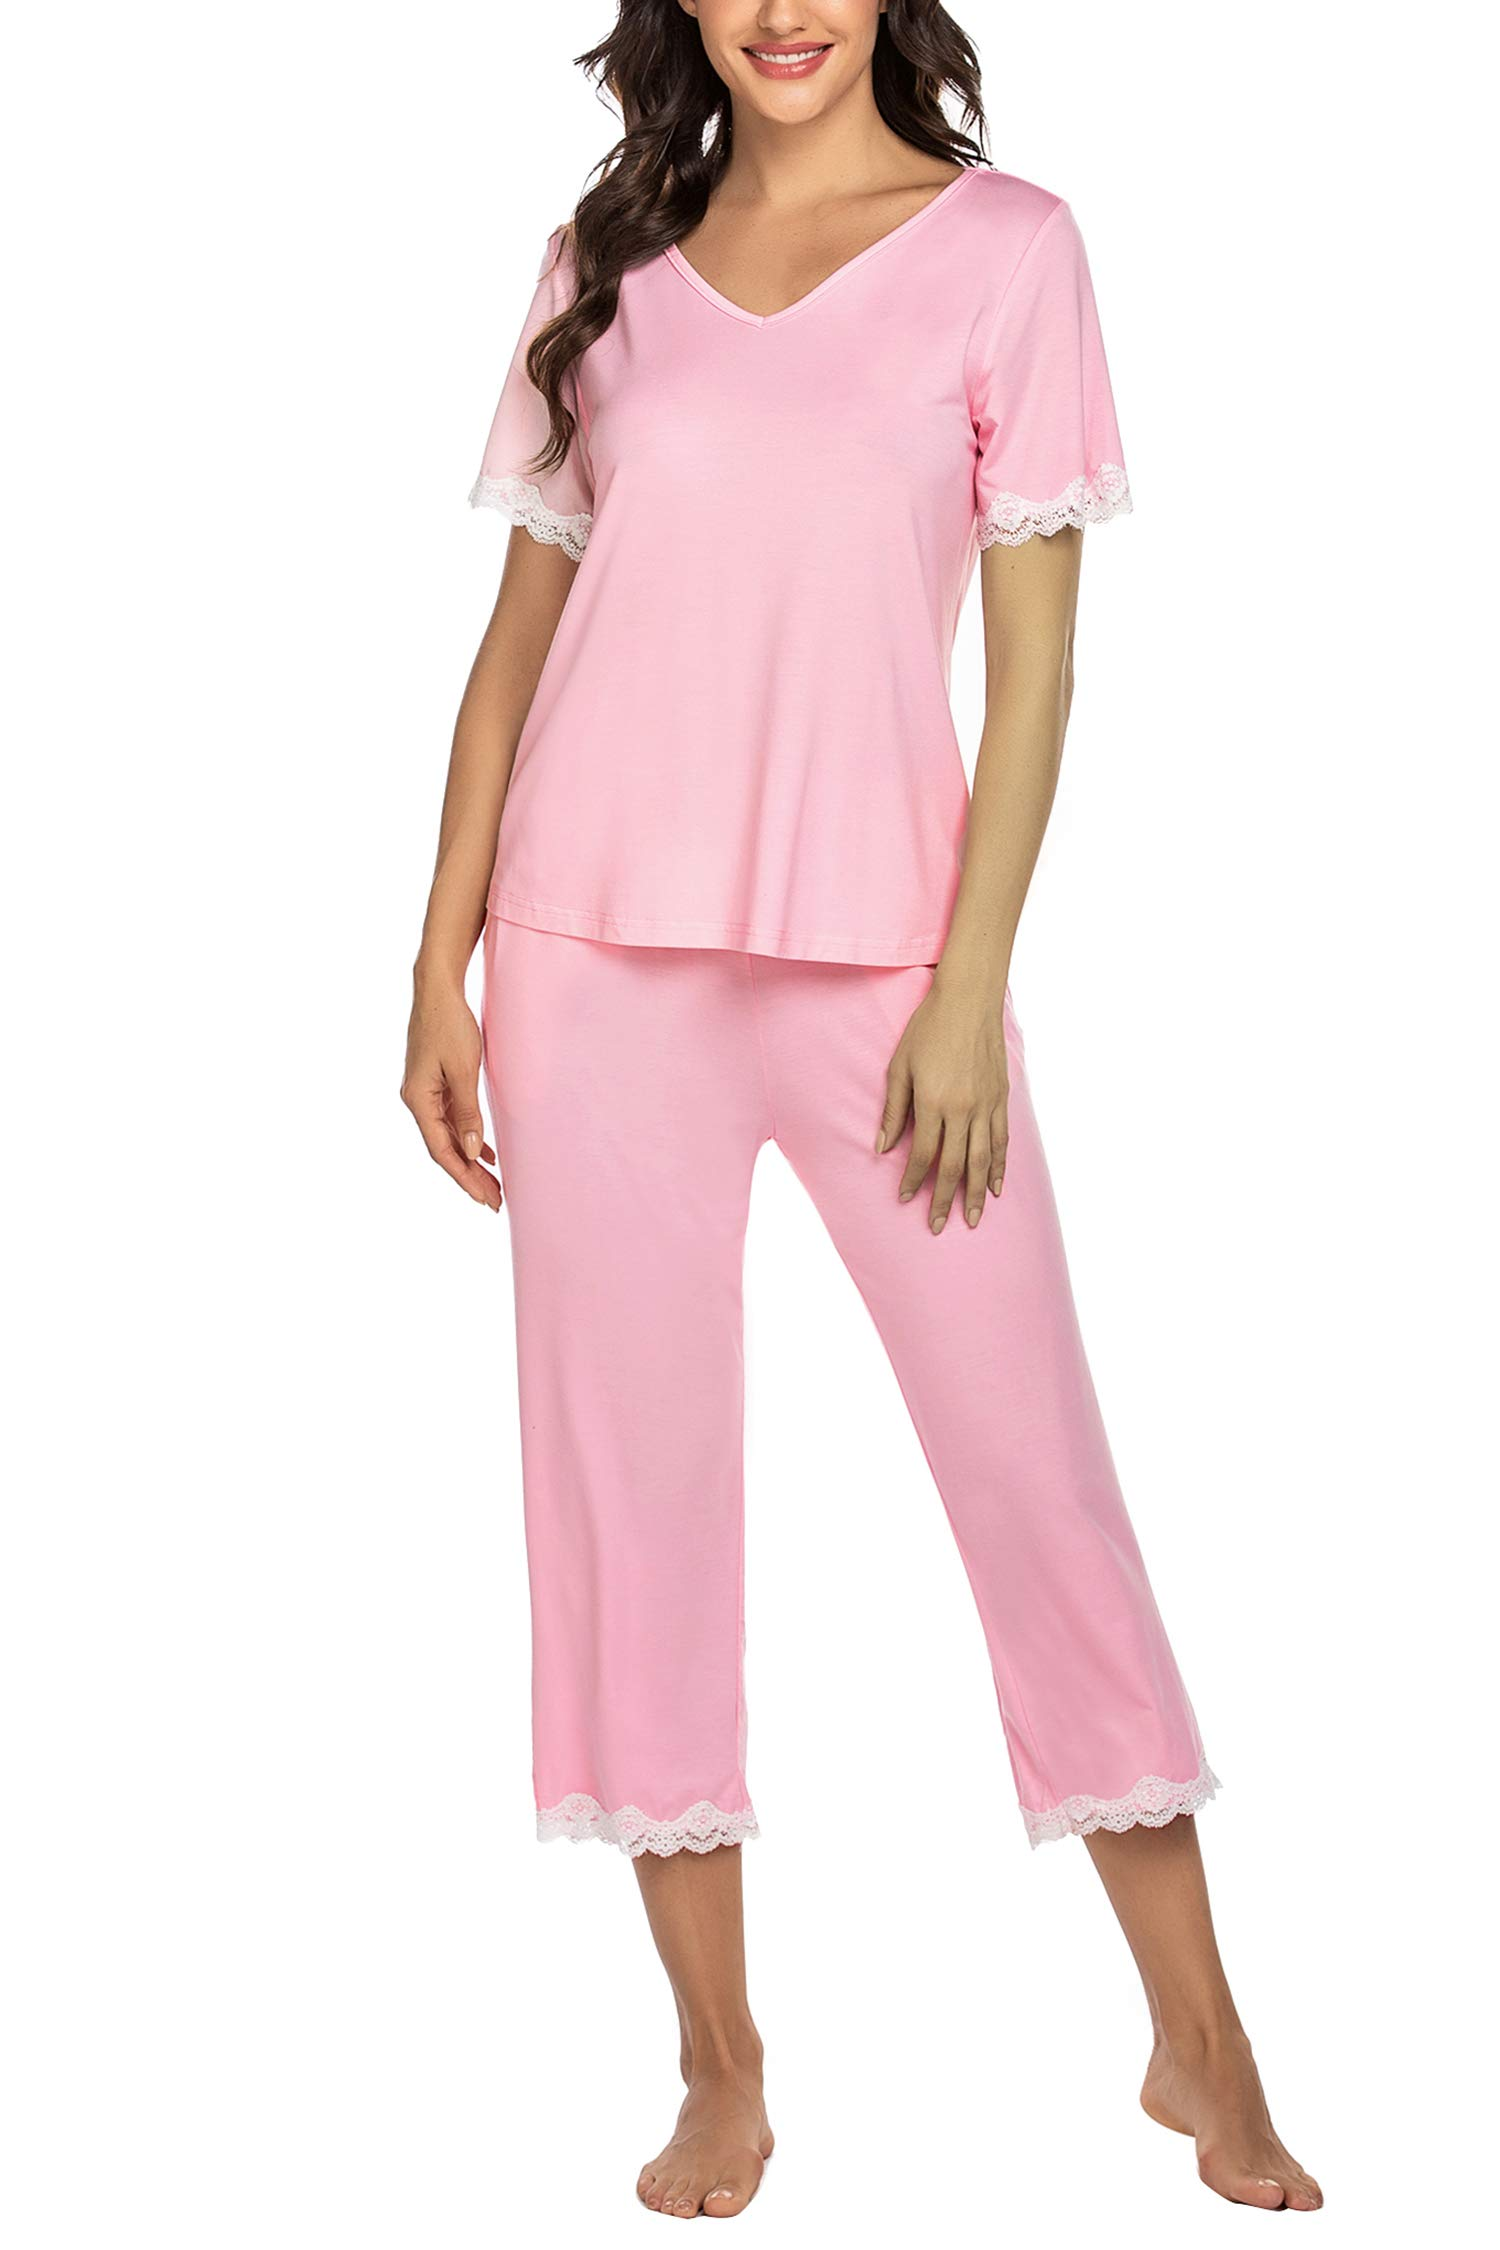 Hotouch Women's Pajamas Set Lace Short Sleeve Sleepwear Top with Capri Pants Pjs Sets S-XXL